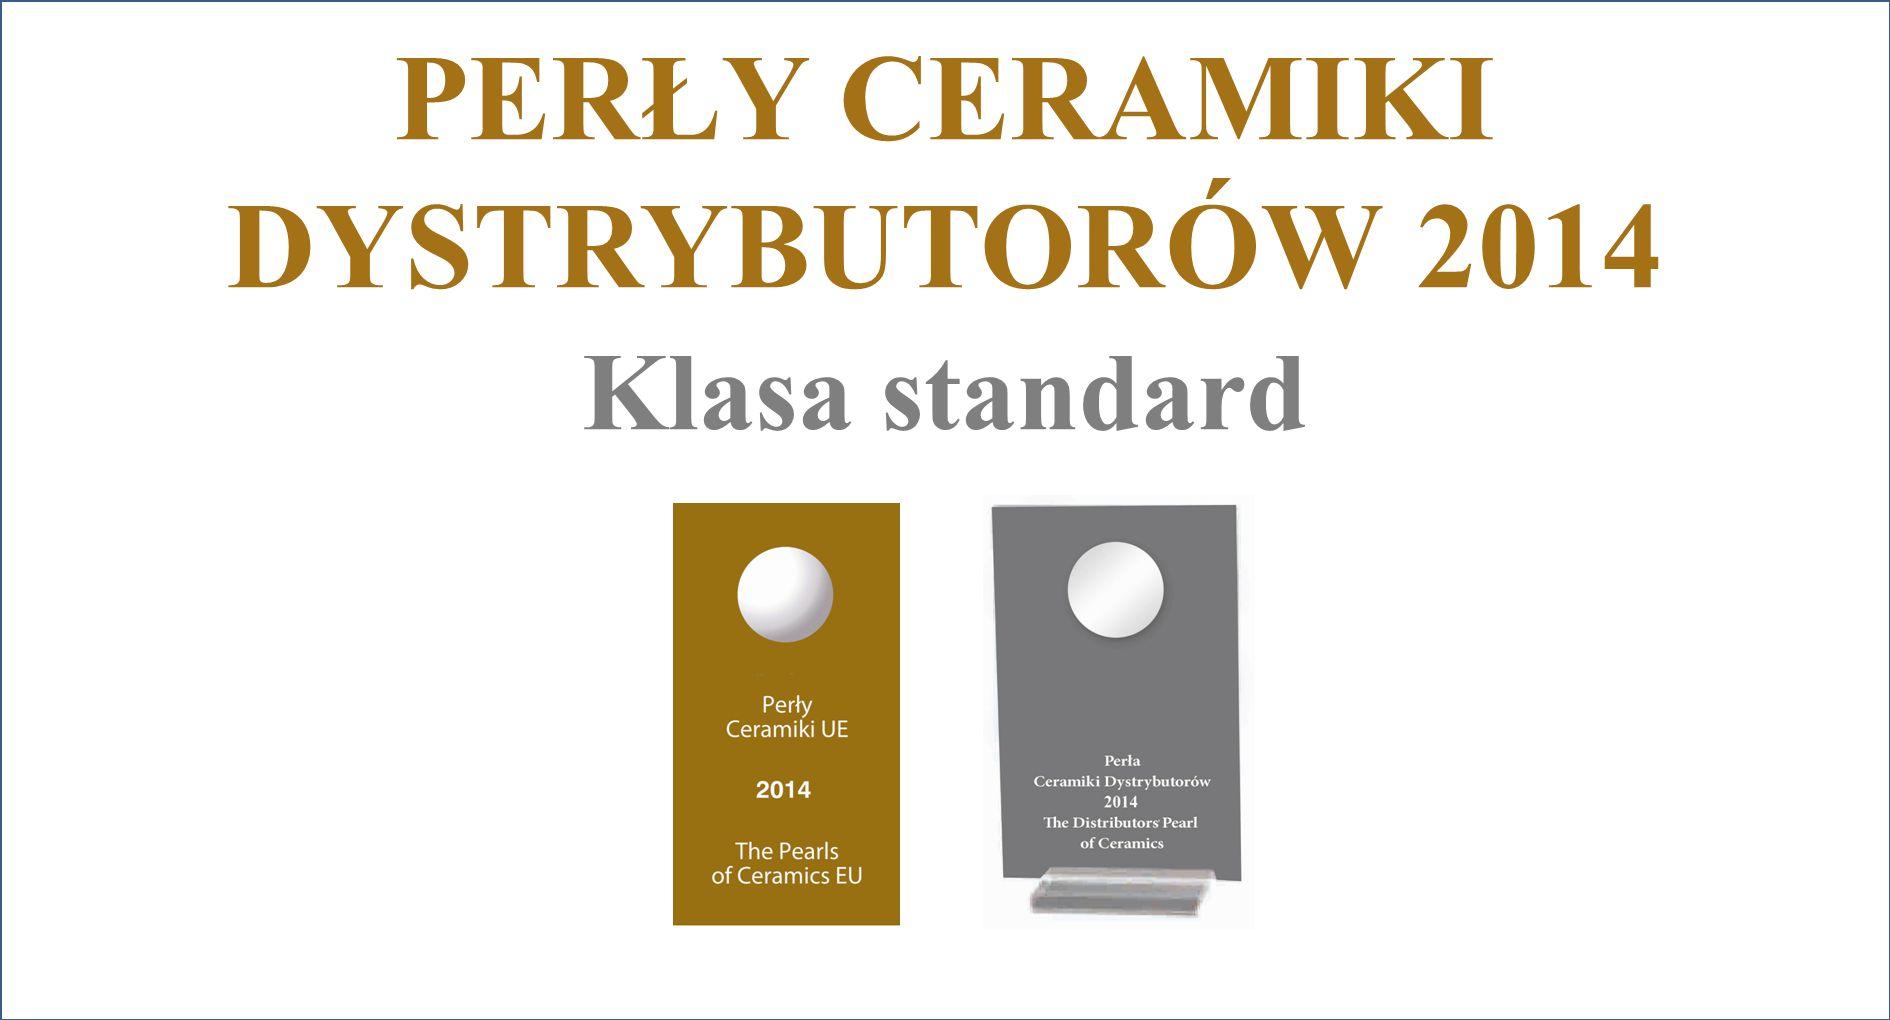 PERŁY CERAMIKI DYSTRYBUTORÓW 2014 Klasa standard